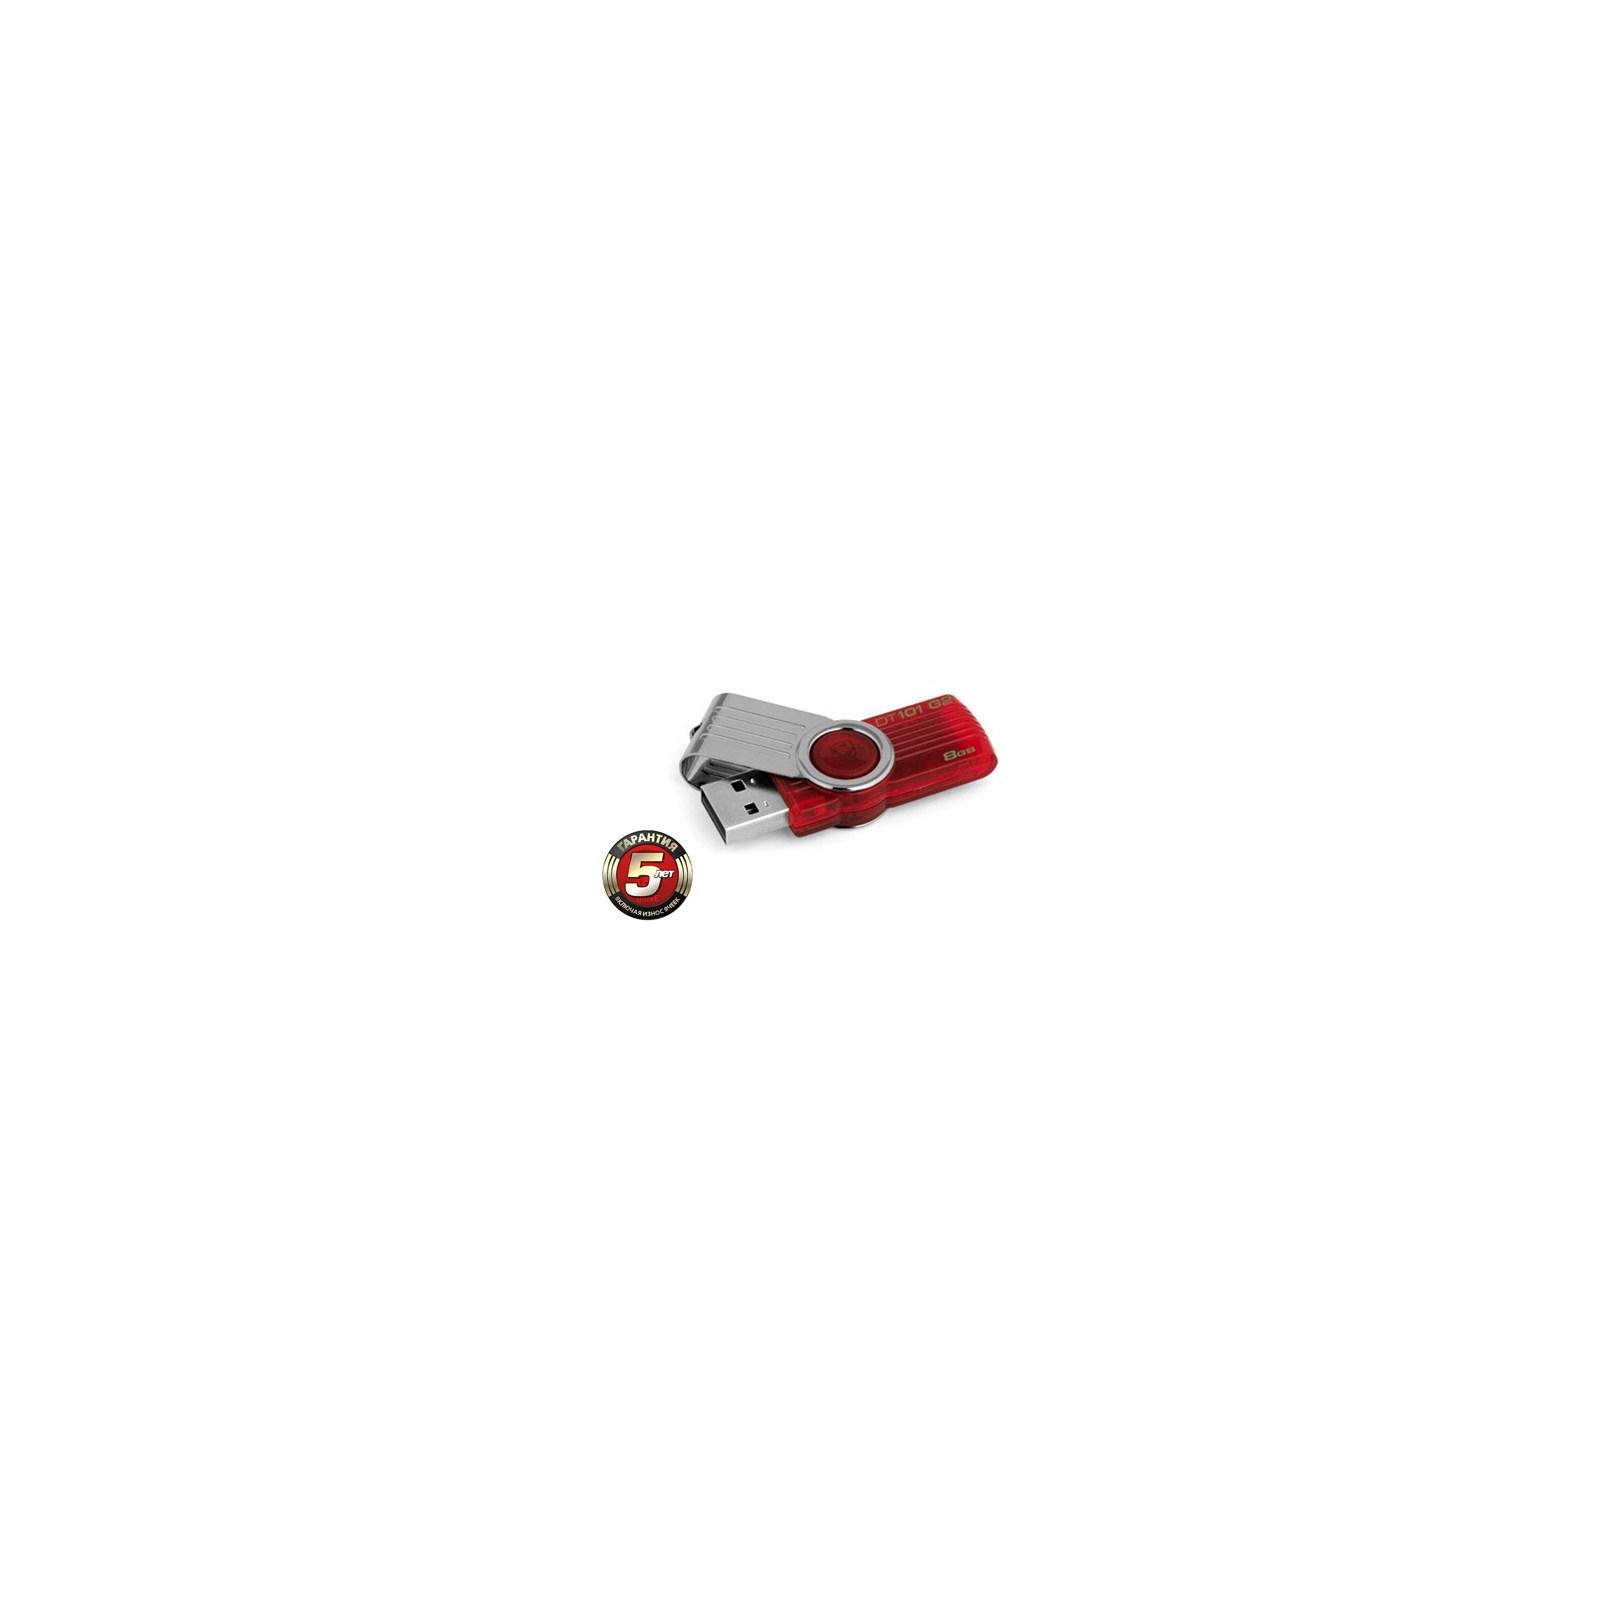 USB флеш накопитель 8Gb DataTraveler 101 G2 Kingston (DT101G2/8GB/DT101G2/8GBZ) изображение 2